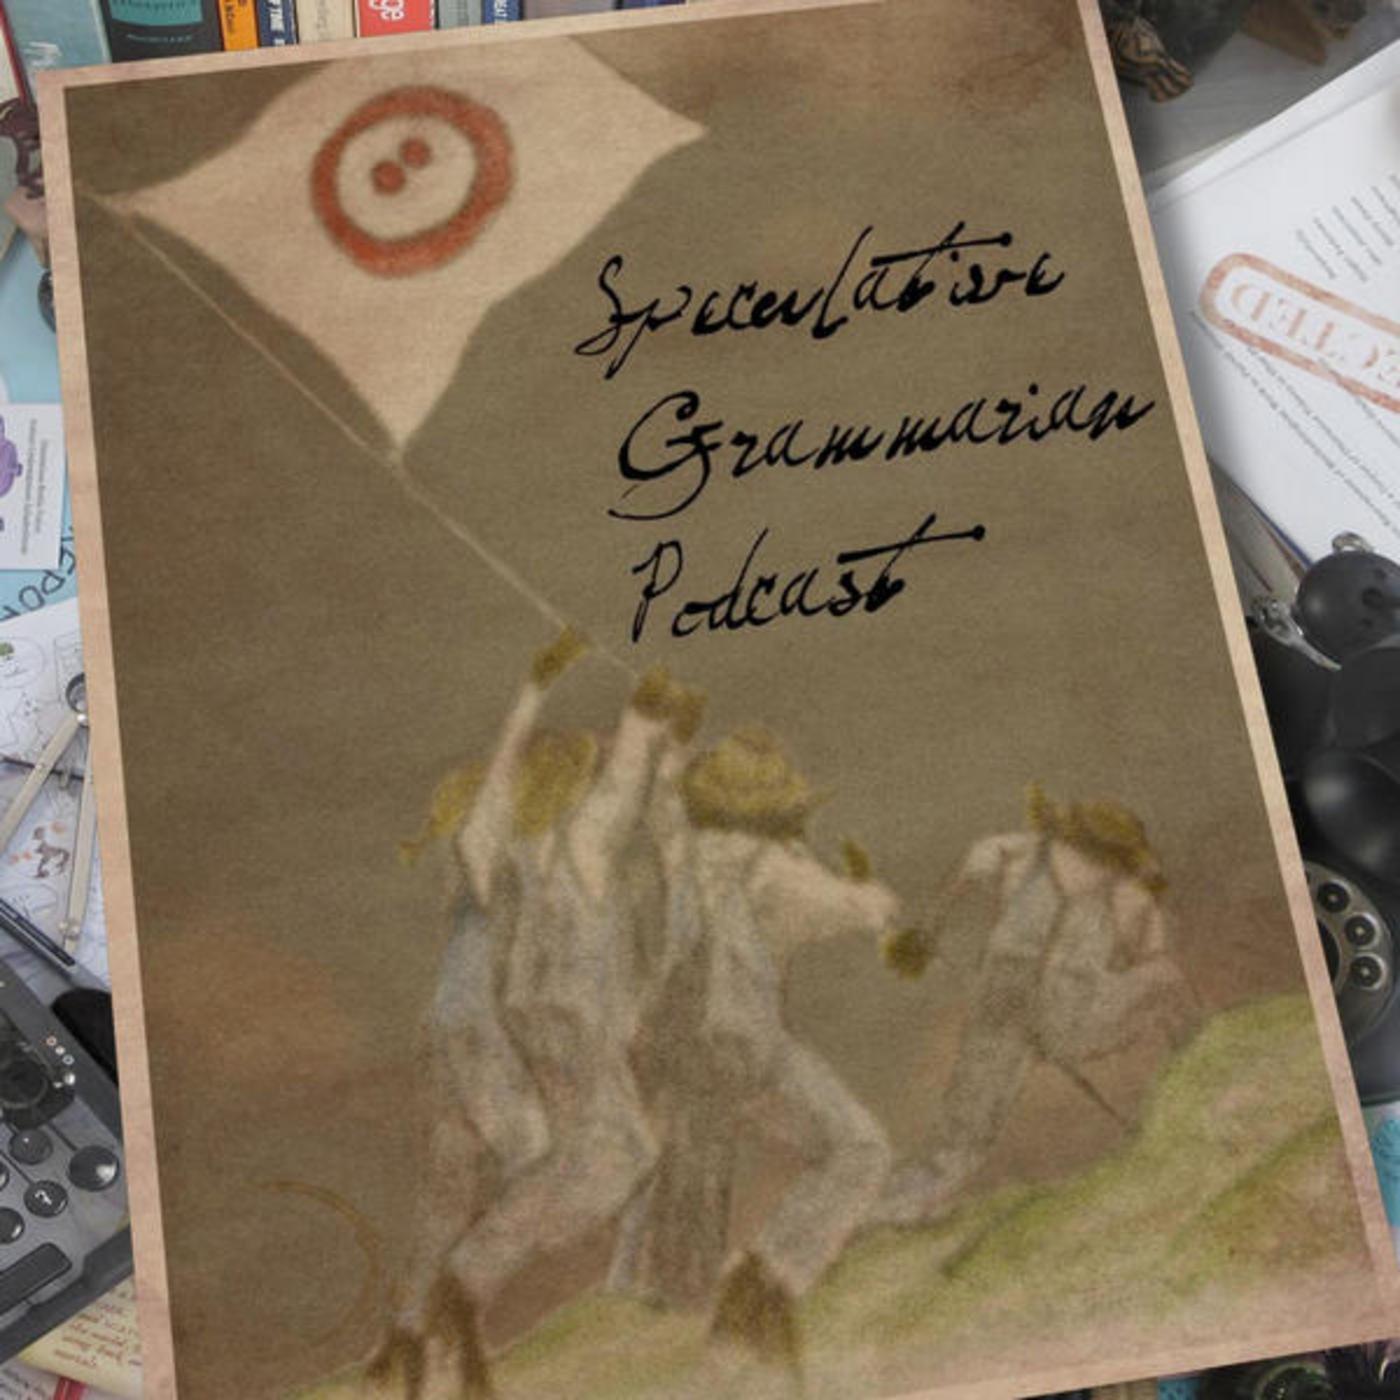 Speculative Grammarian Podcast